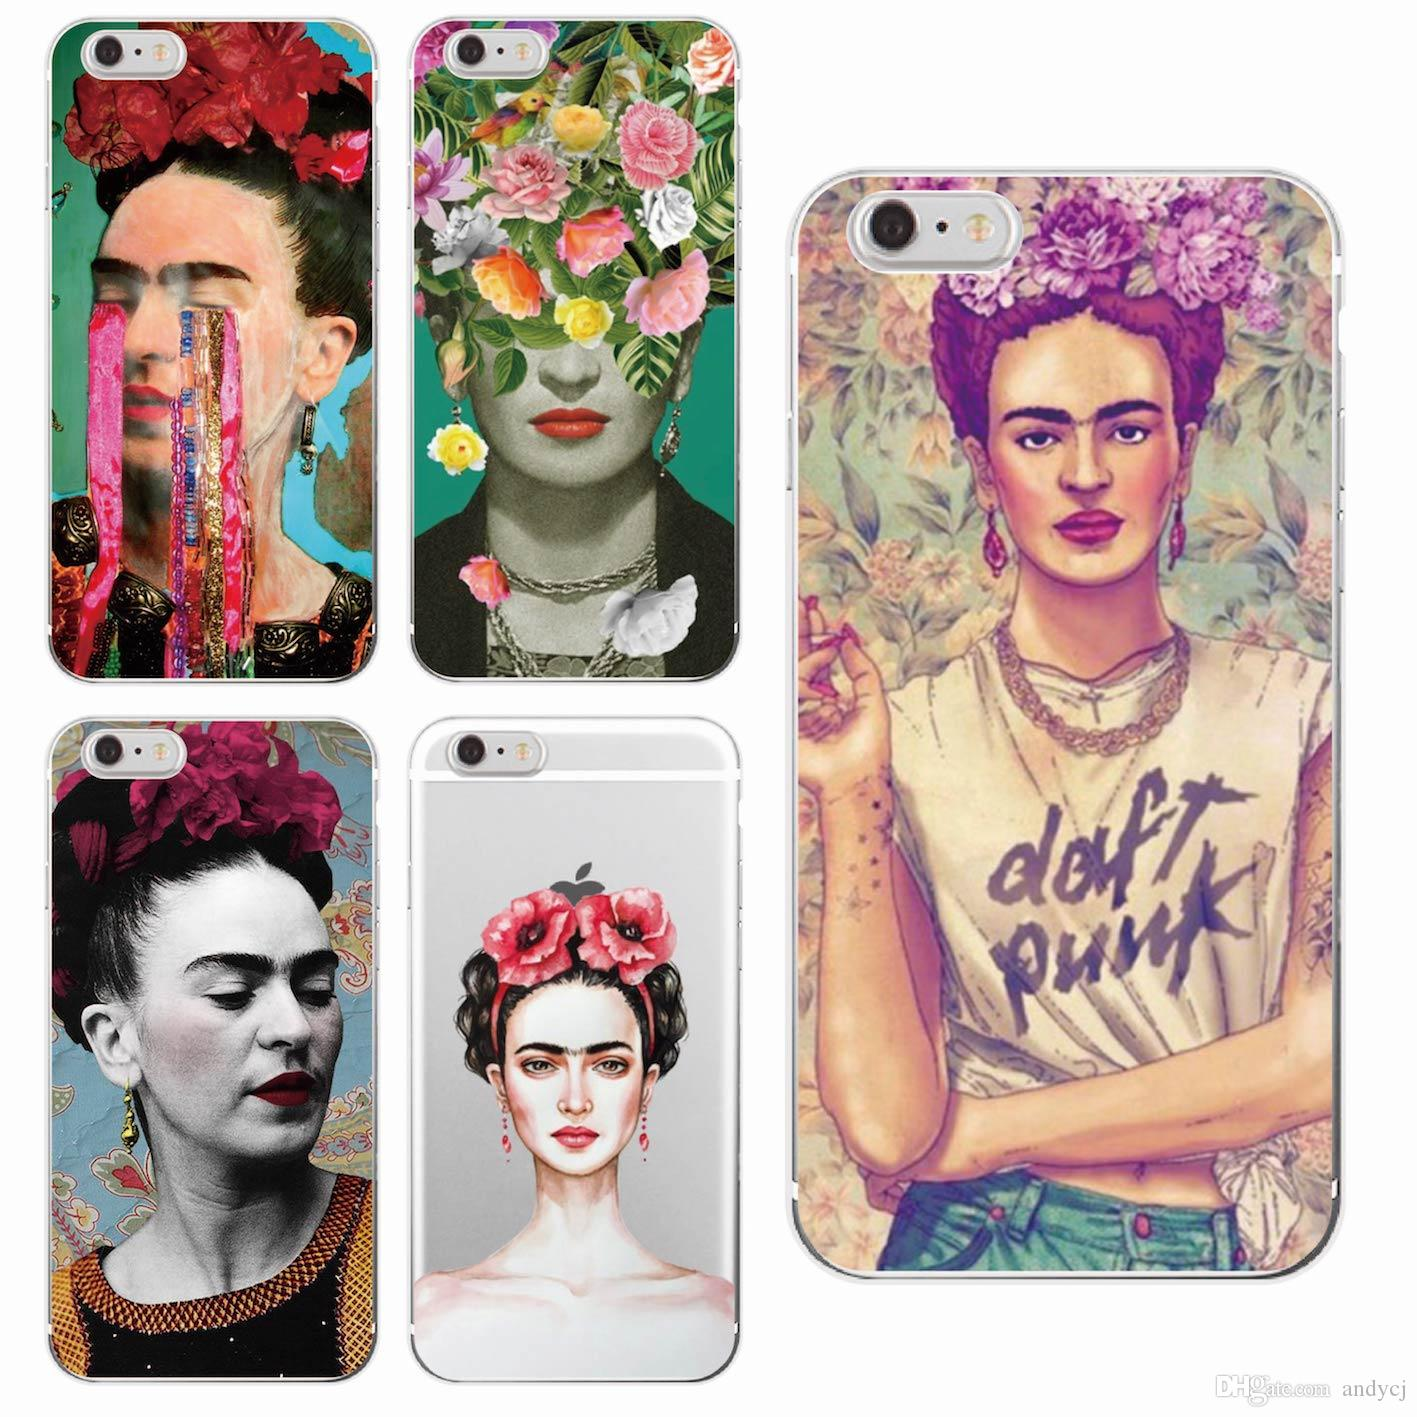 afafee909f9 Accesorios Para El Movil Mexicana Frida Kahlo Artista Flor Floral Soft  Phone Para IPhone 7 7plus 6 6S 6Plus 5 5S SE 5C 4 4S SAMSUNG Protectores  Para ...